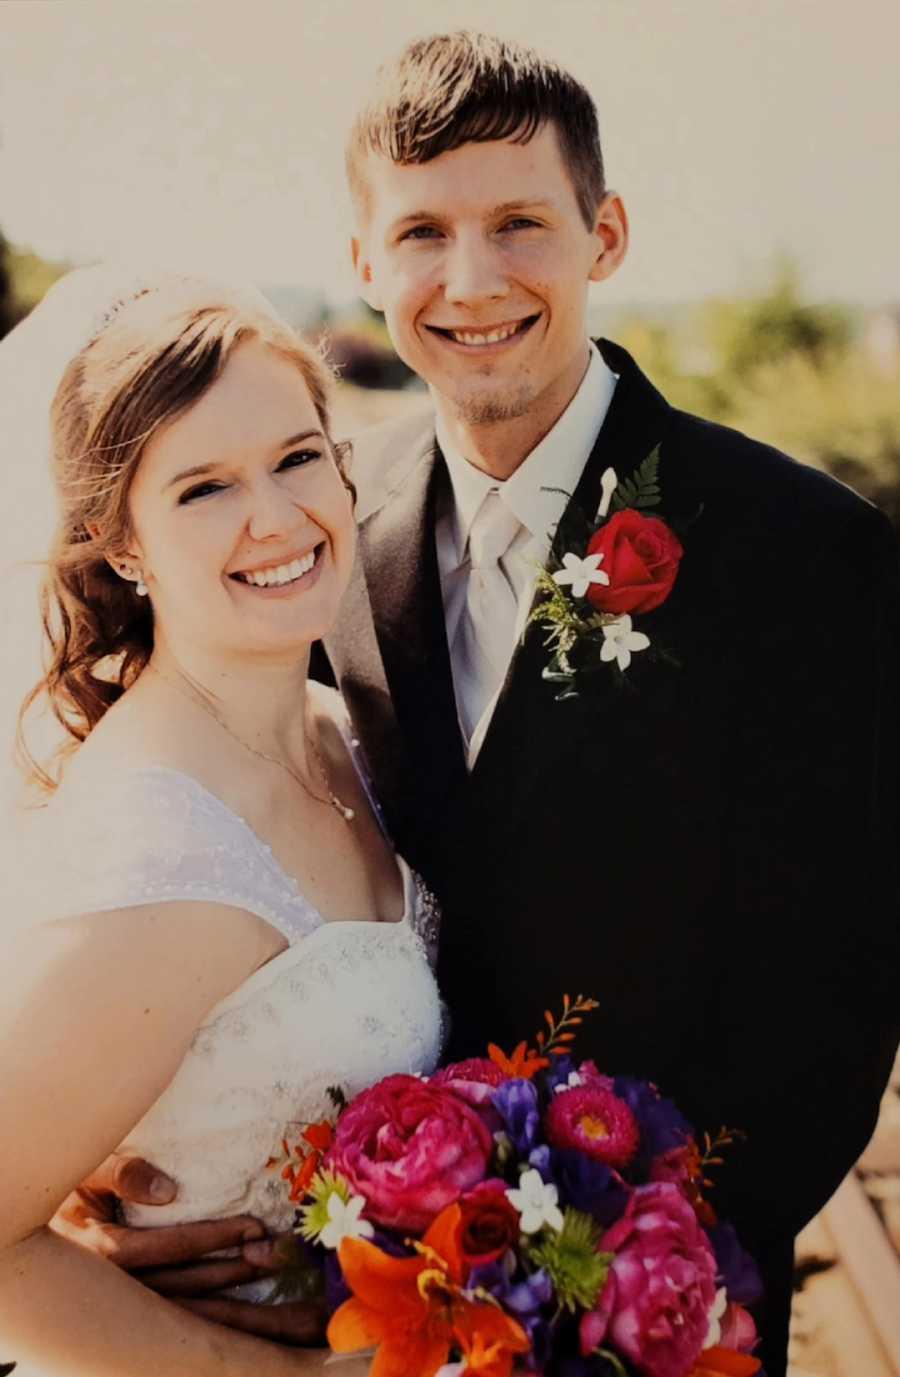 young couple on wedding day